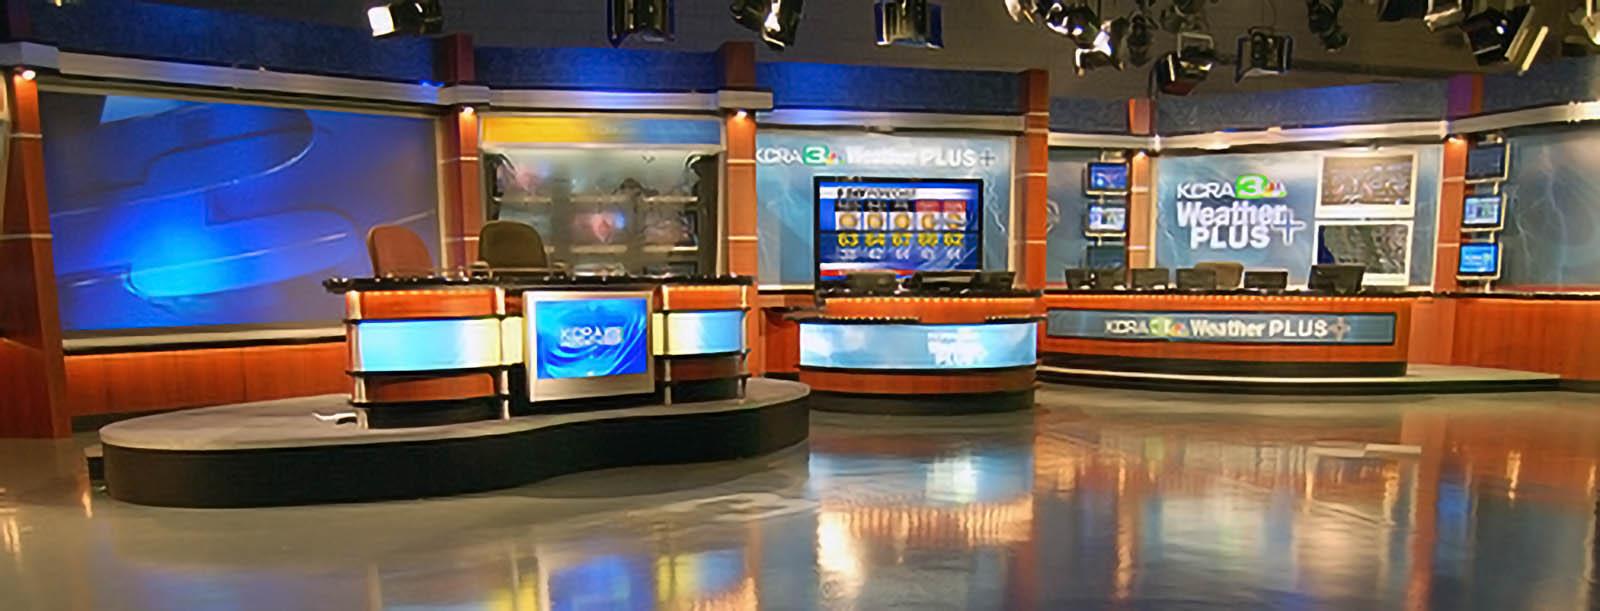 KCRA 3 News studio